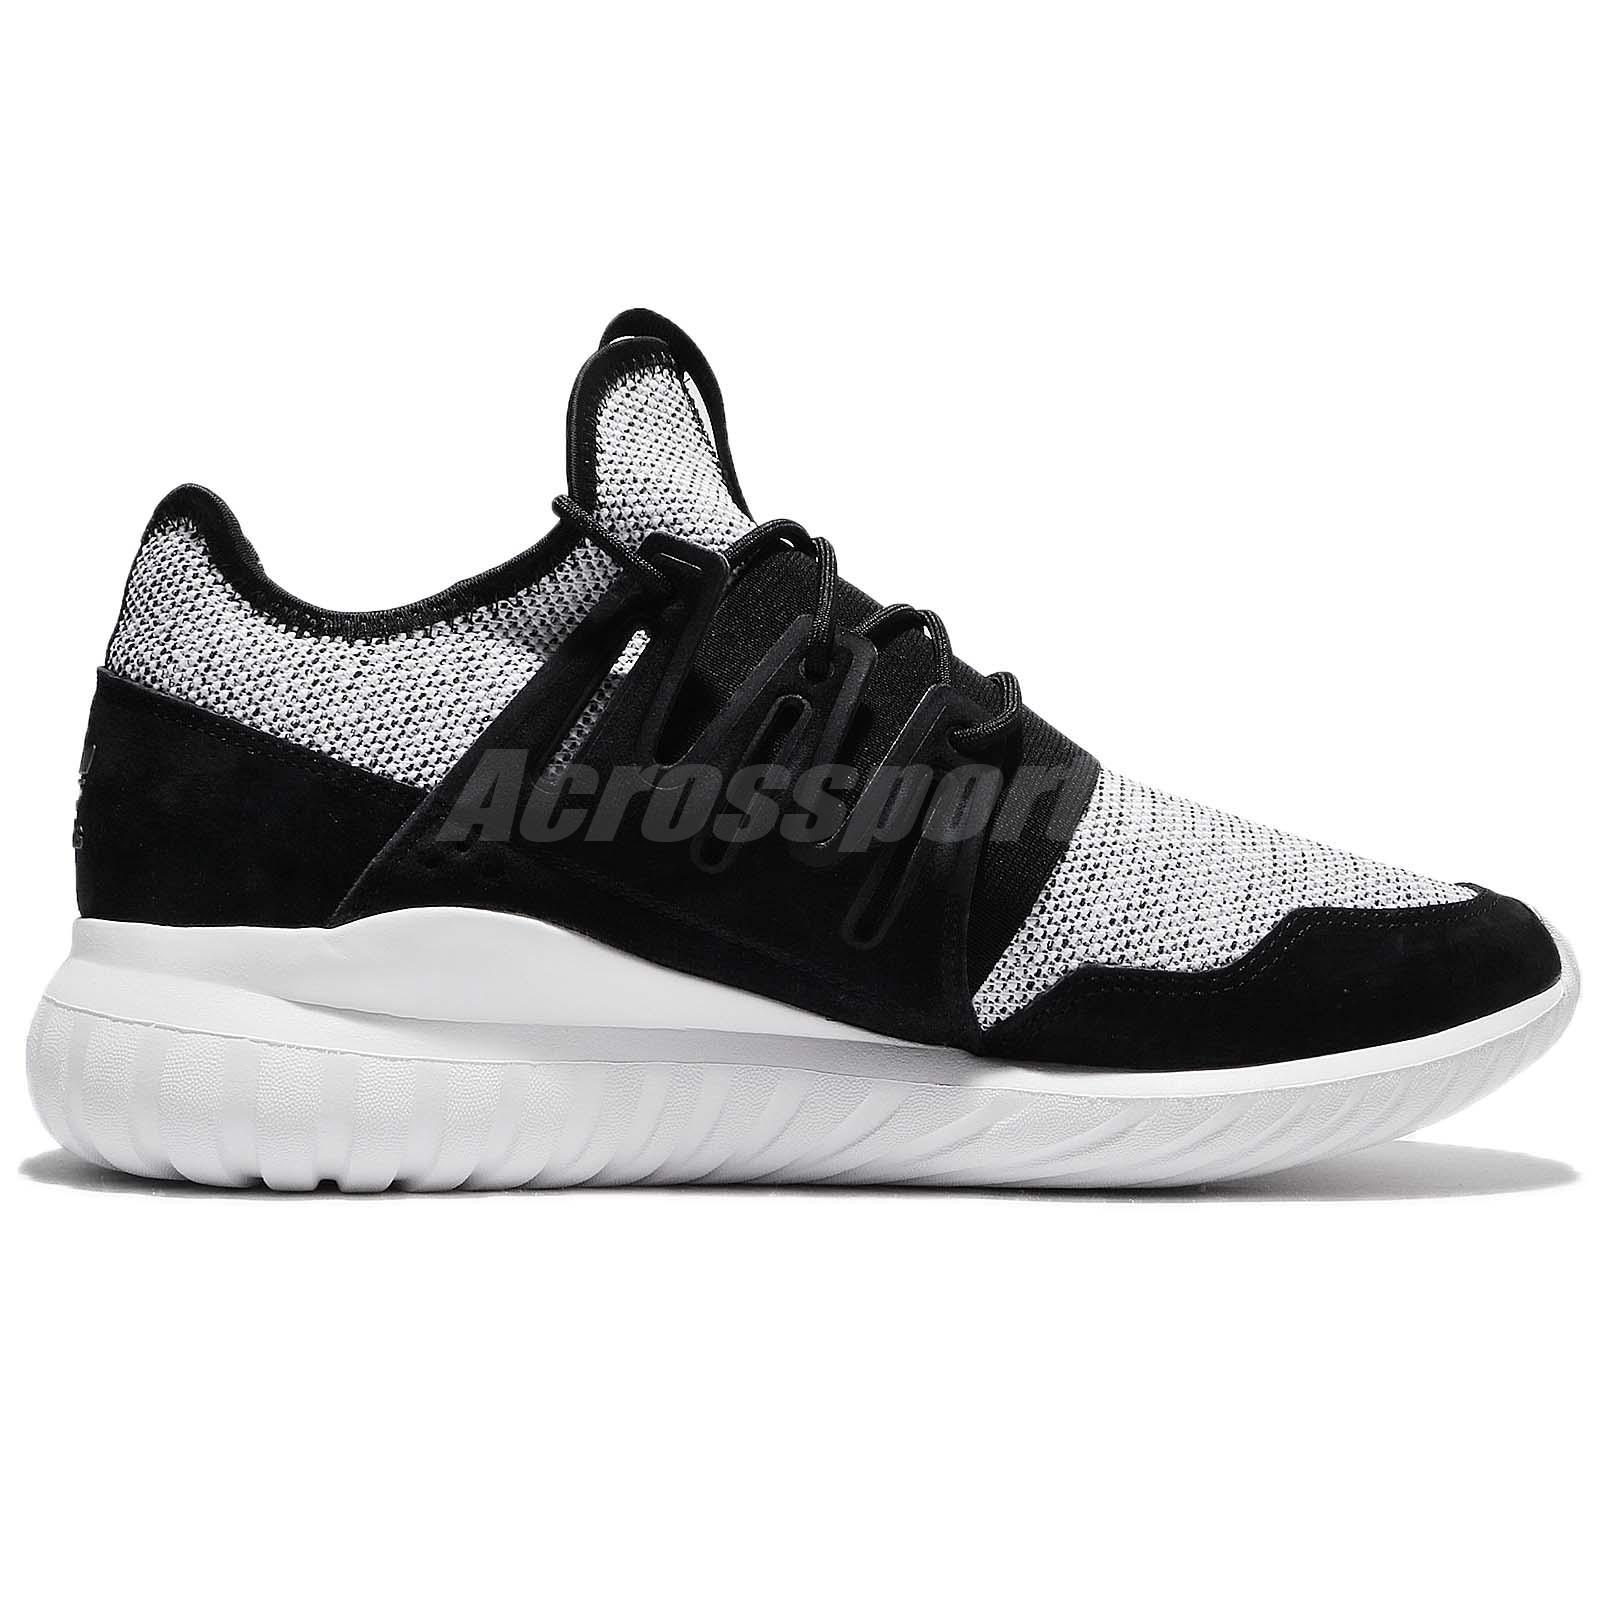 2442b63c99ce22 adidas Originals Tubular Radial Black White Men Running Shoes ...